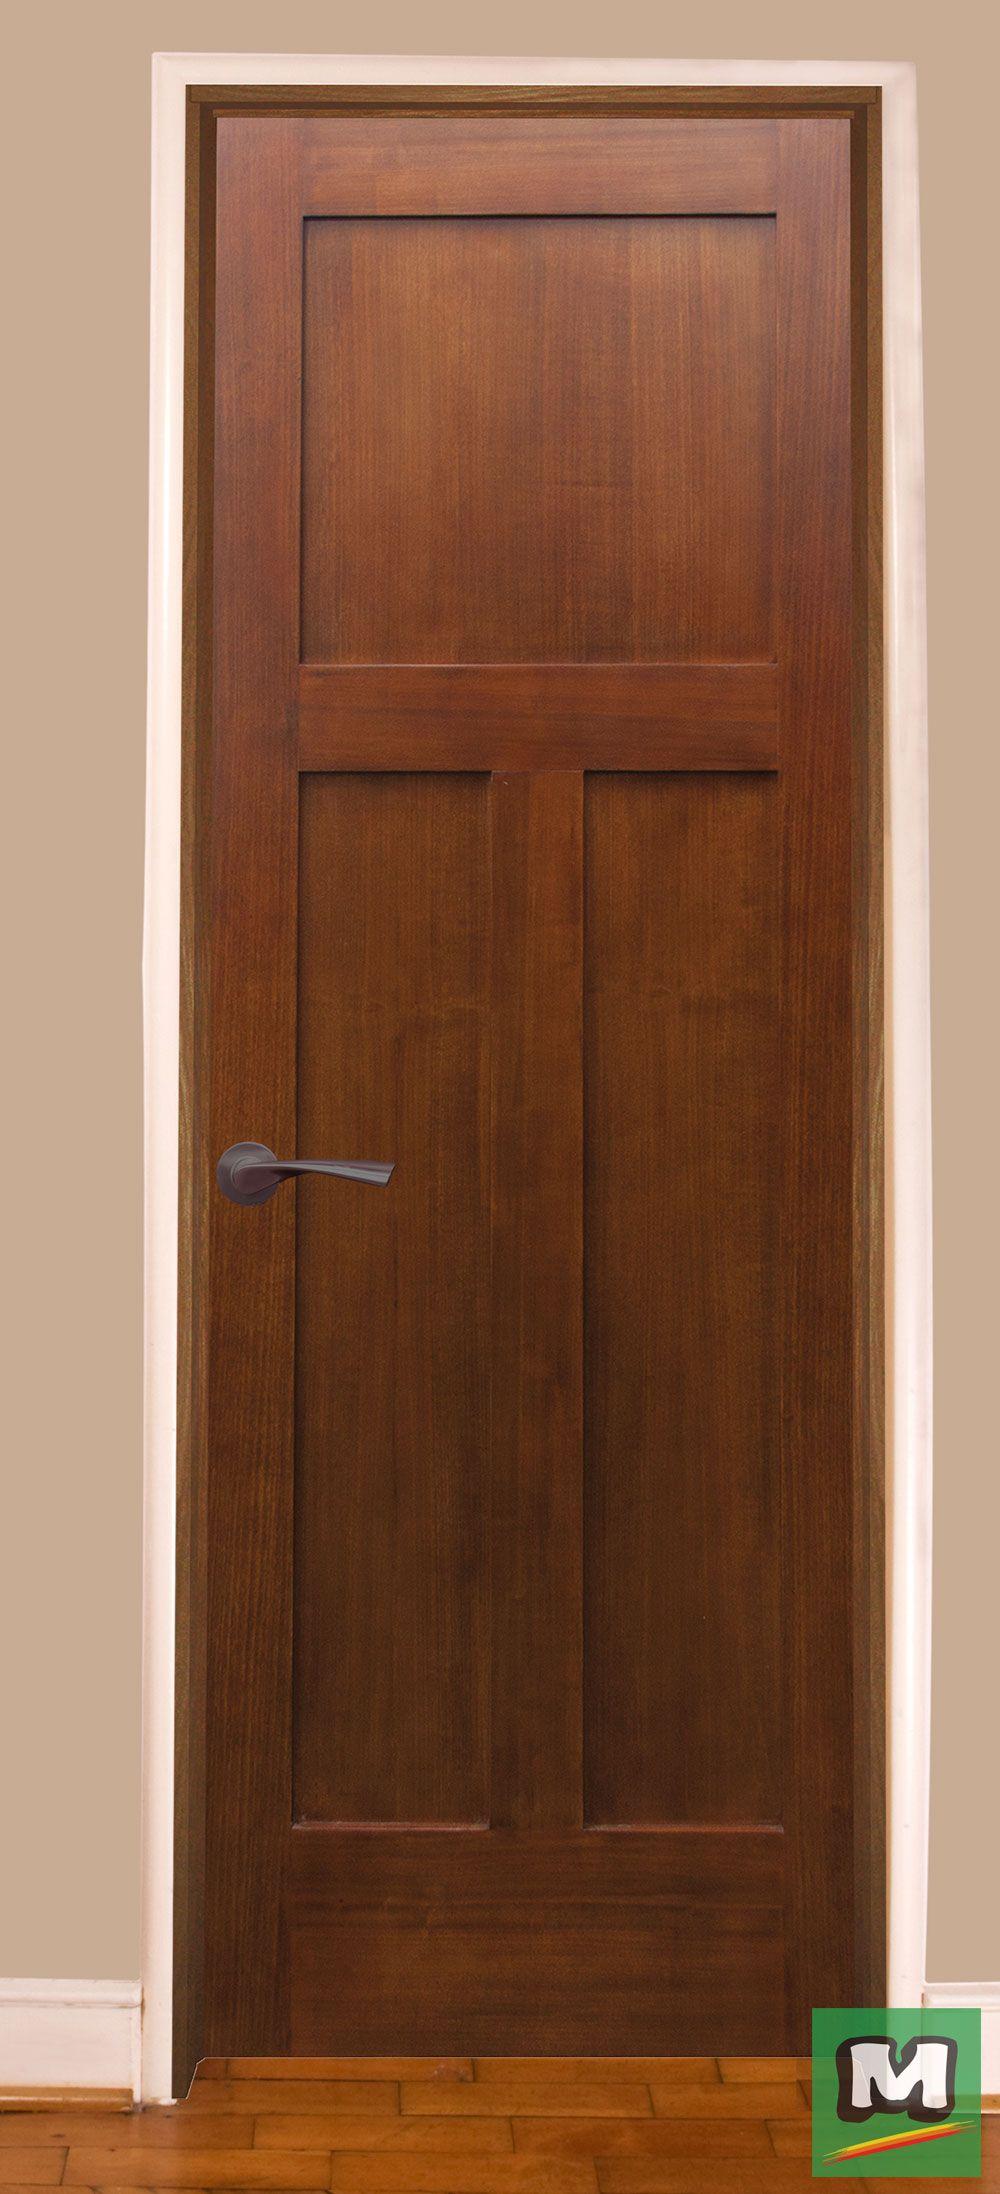 Add This Mastercraft 3 Panel Craftsman Door With Frame To Any Room In Your Home It C Craftsman Interior Doors Solid Core Interior Doors Prehung Interior Doors